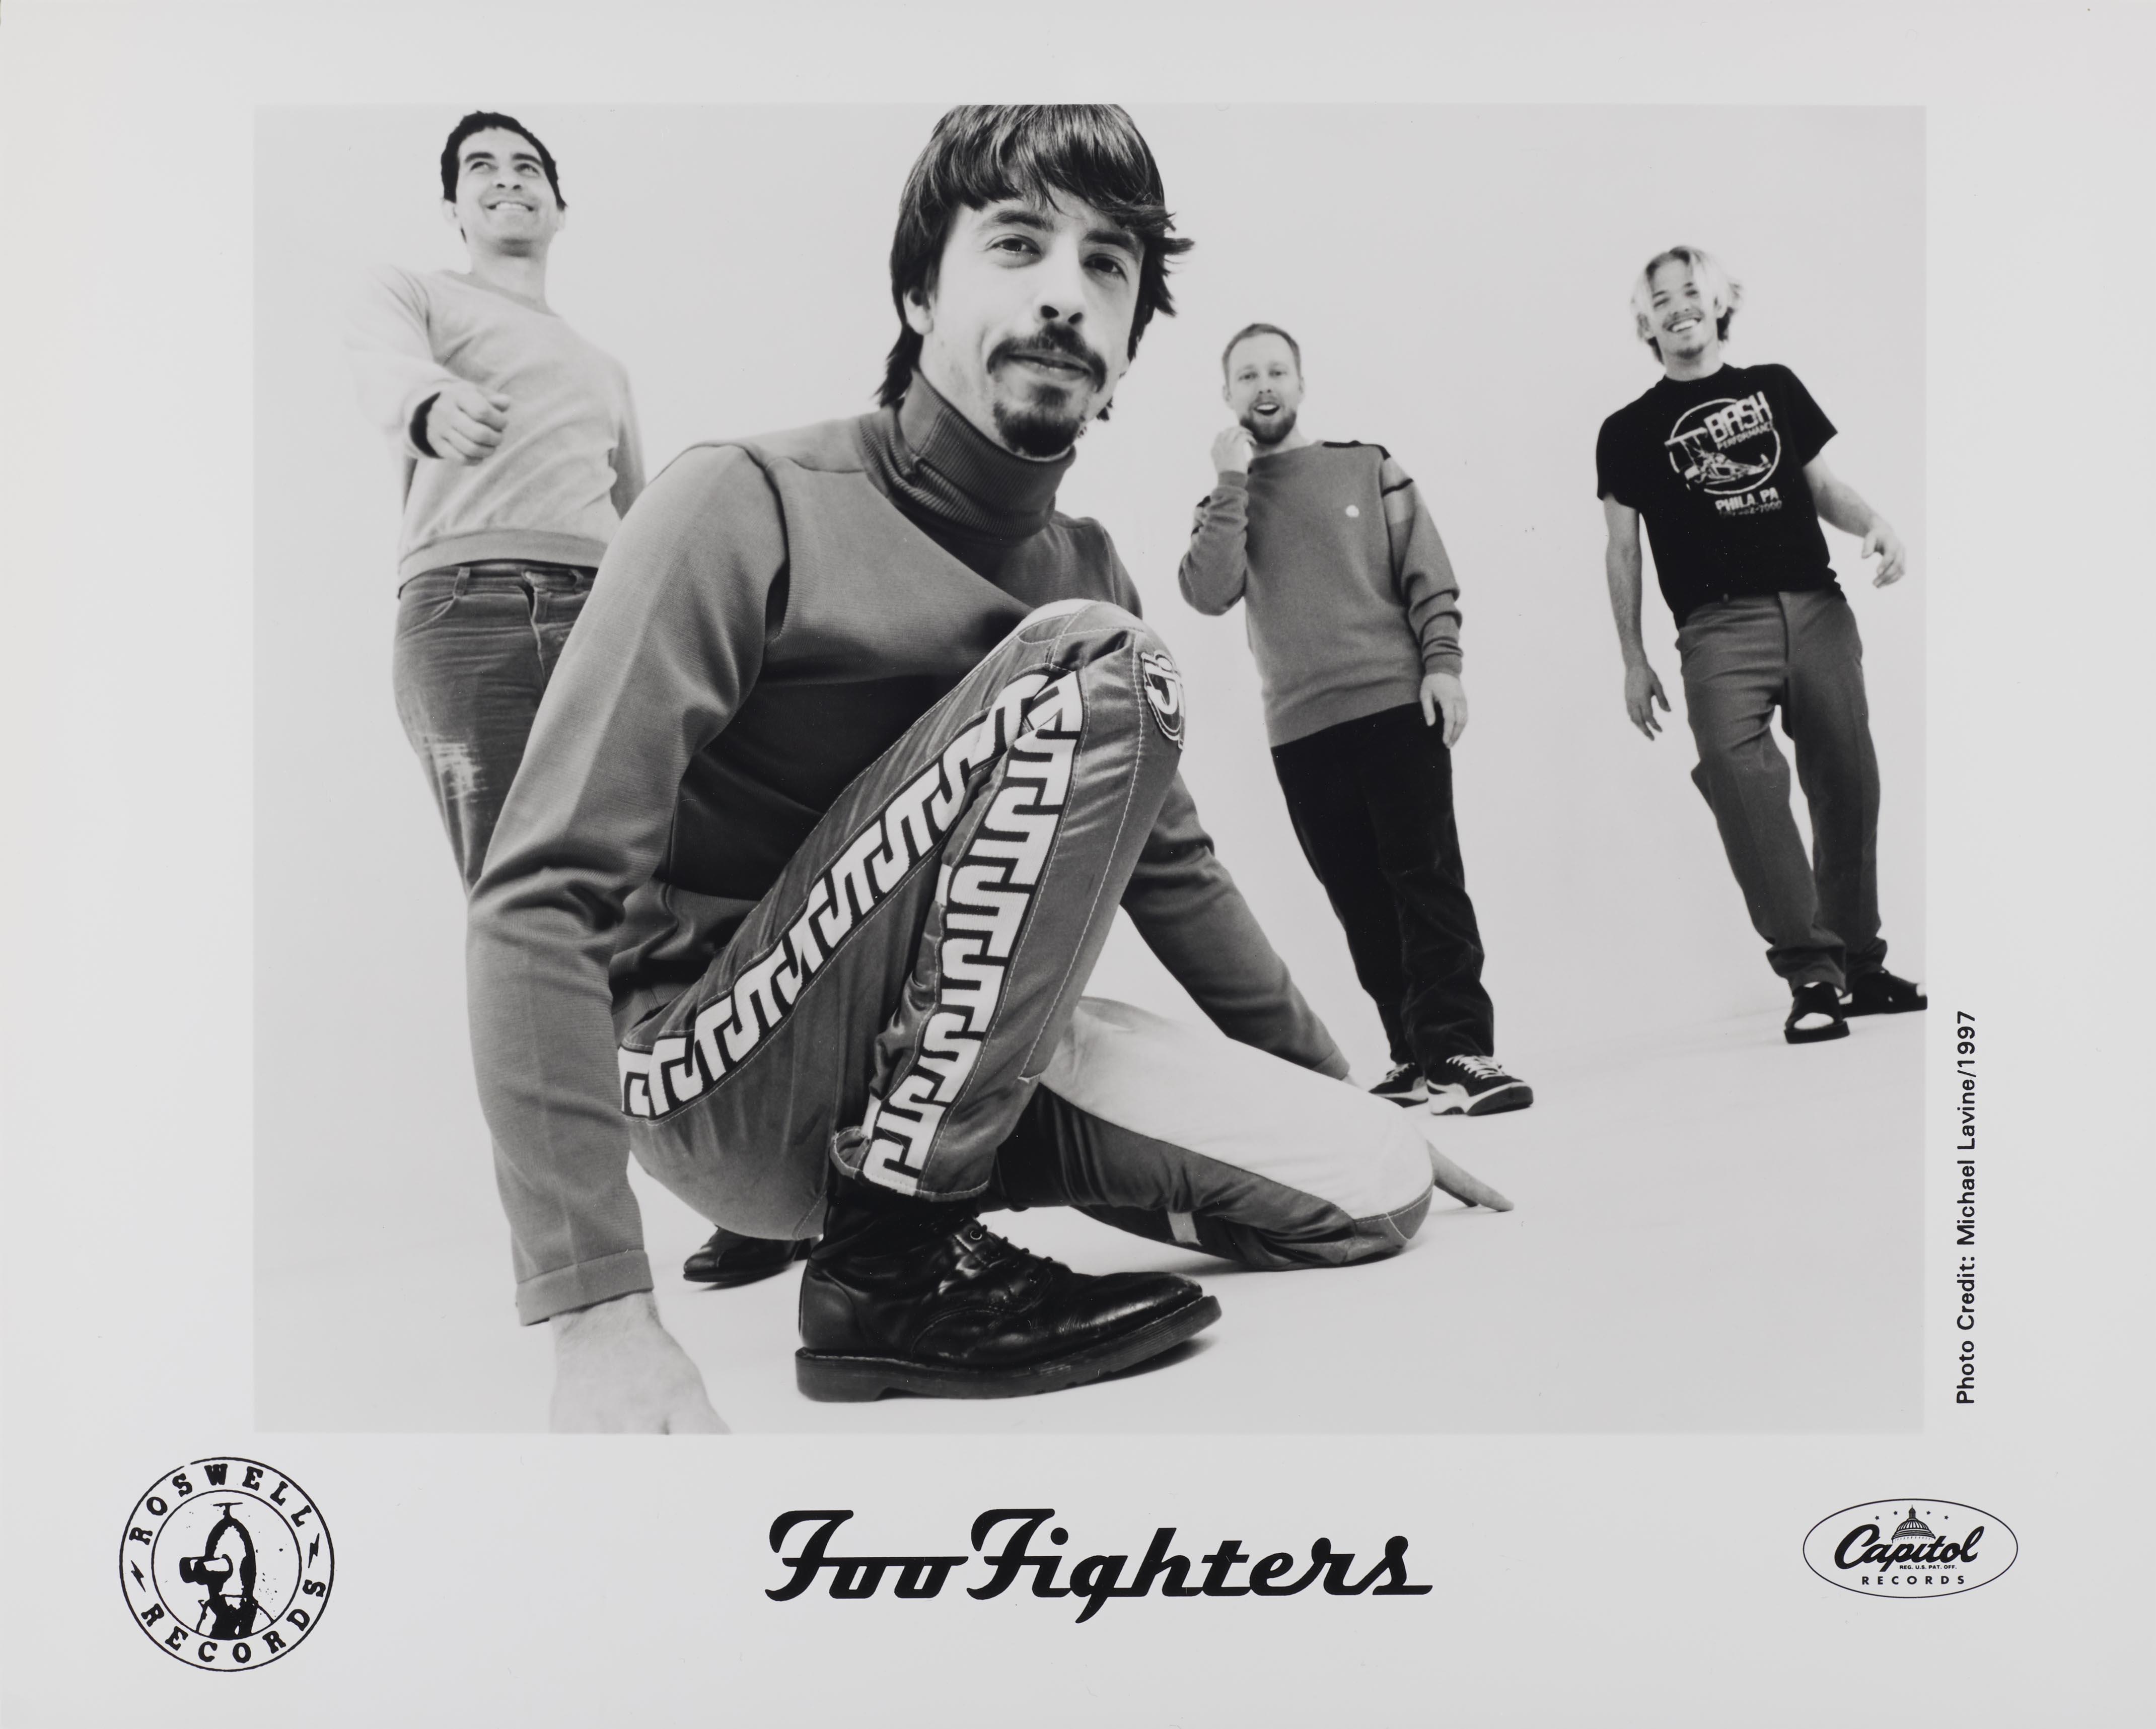 Foo Fighters promo photo, 1997